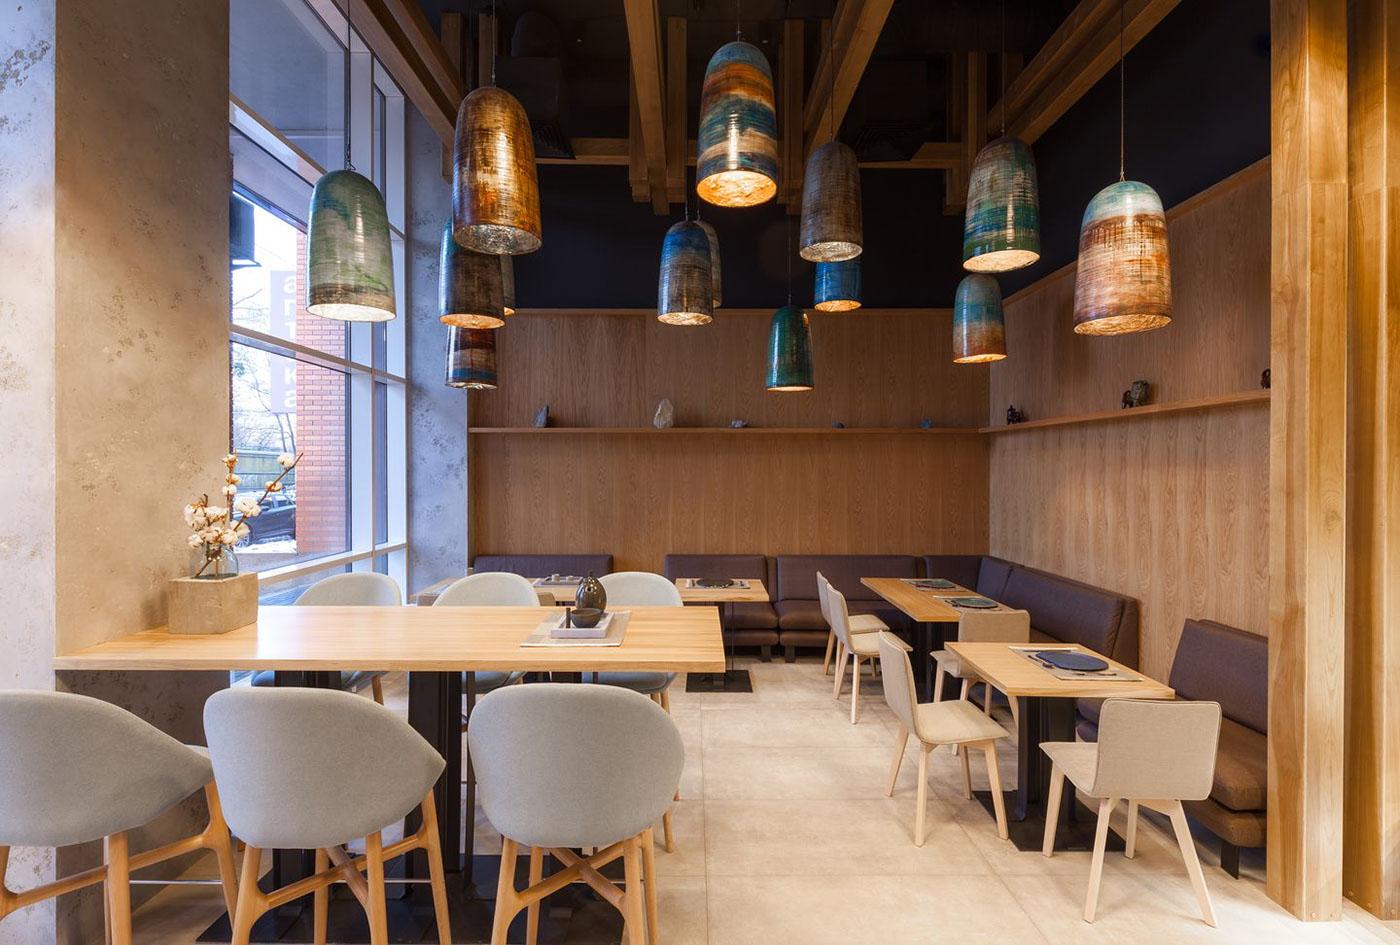 Brahms restaurant on behance